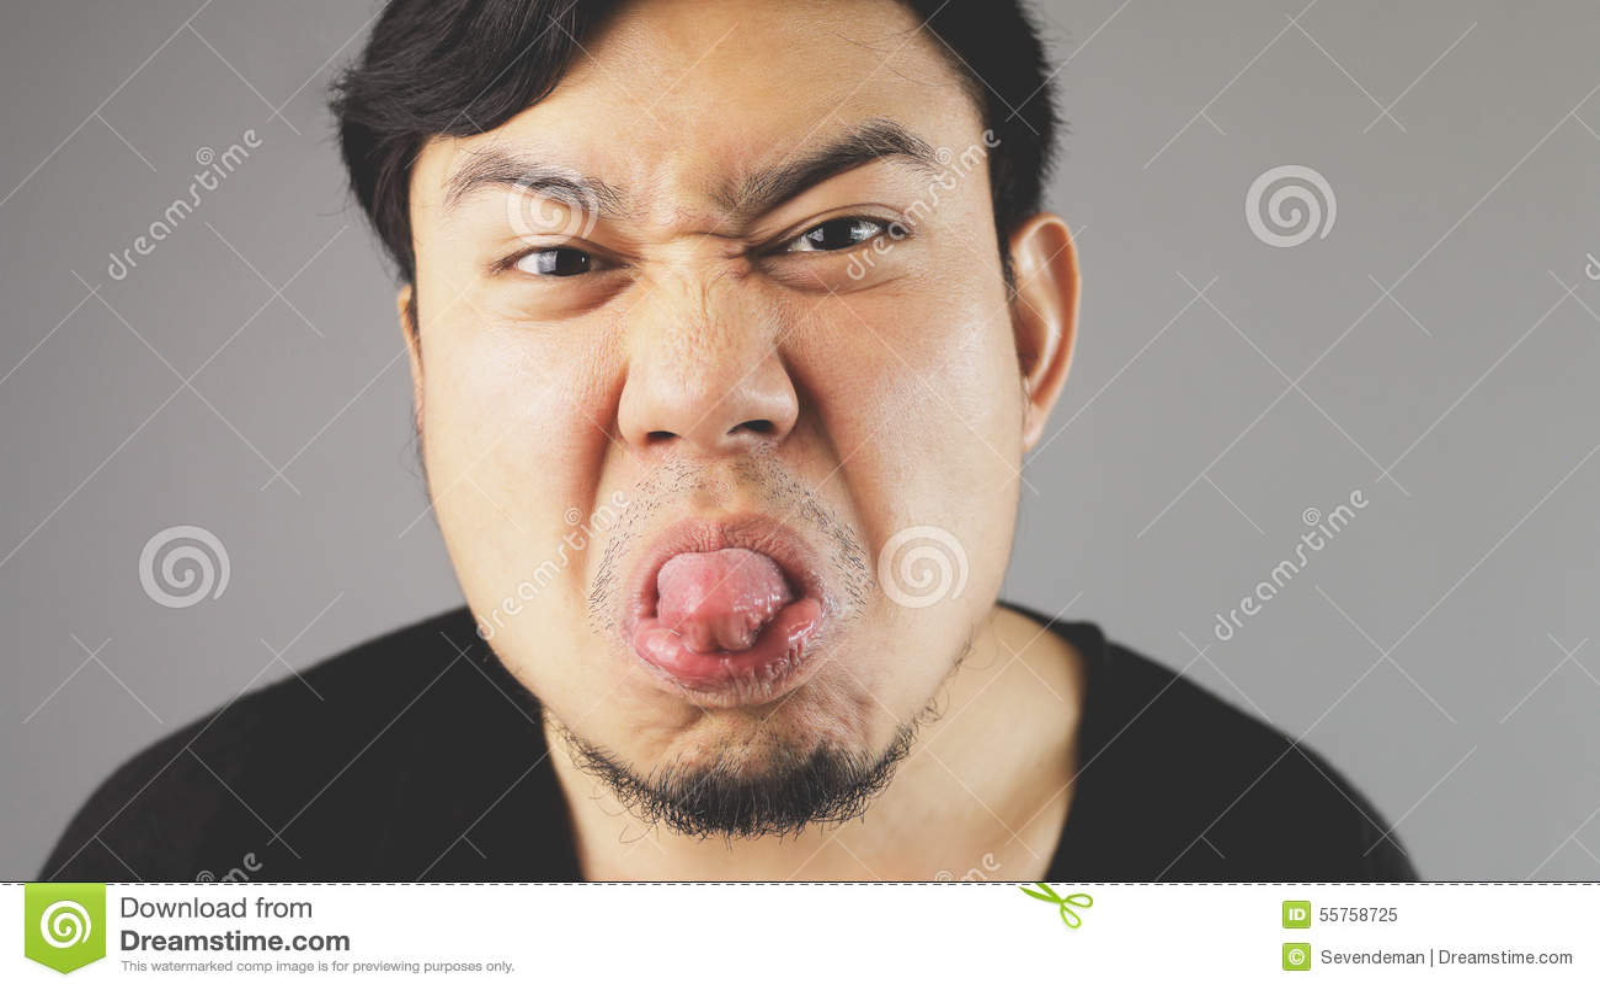 Teasing tongue